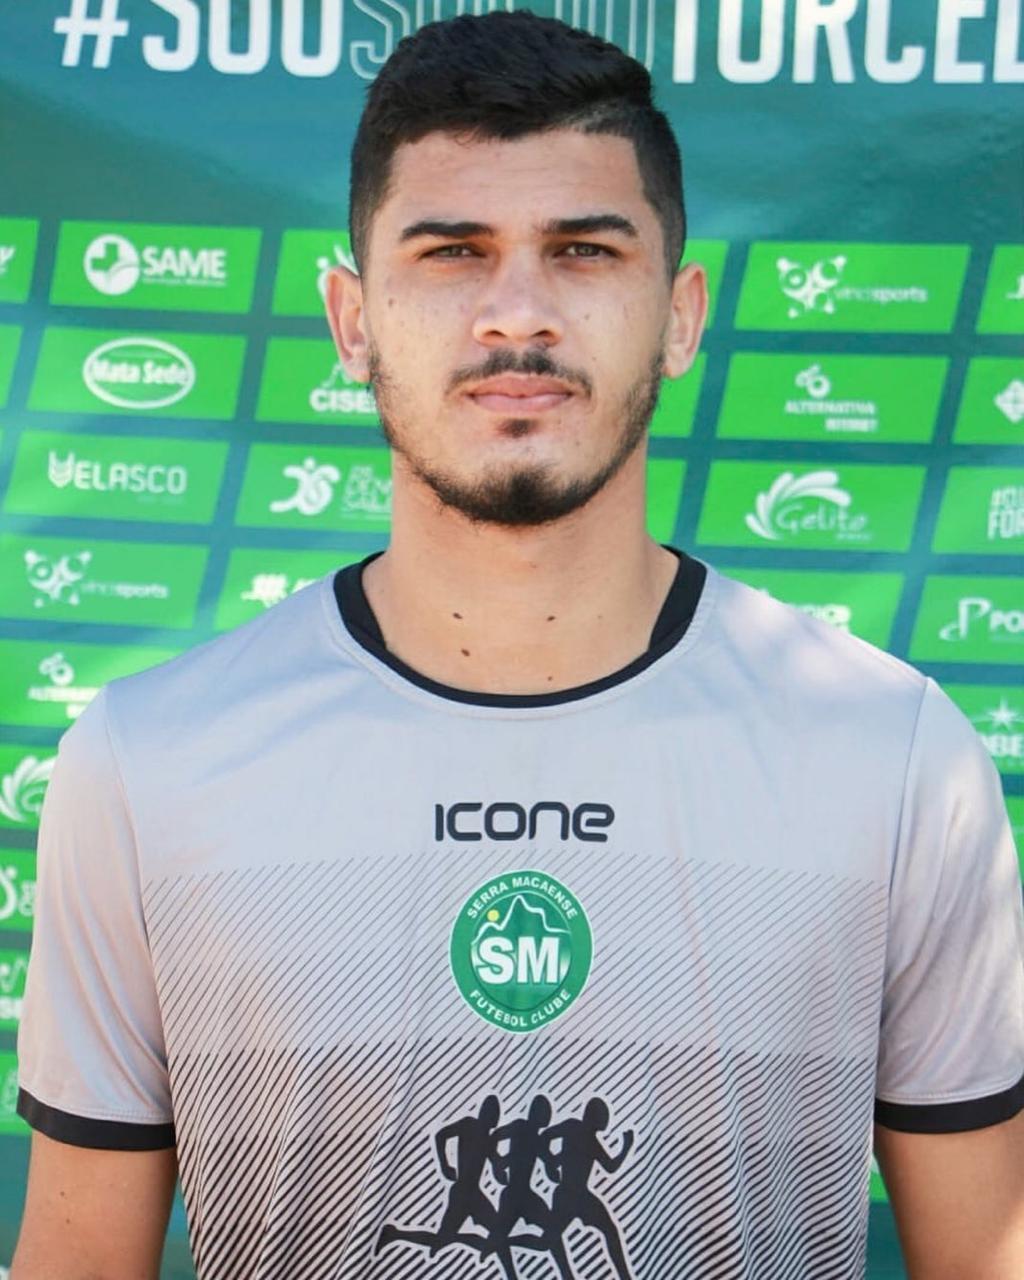 Denis Oliveira